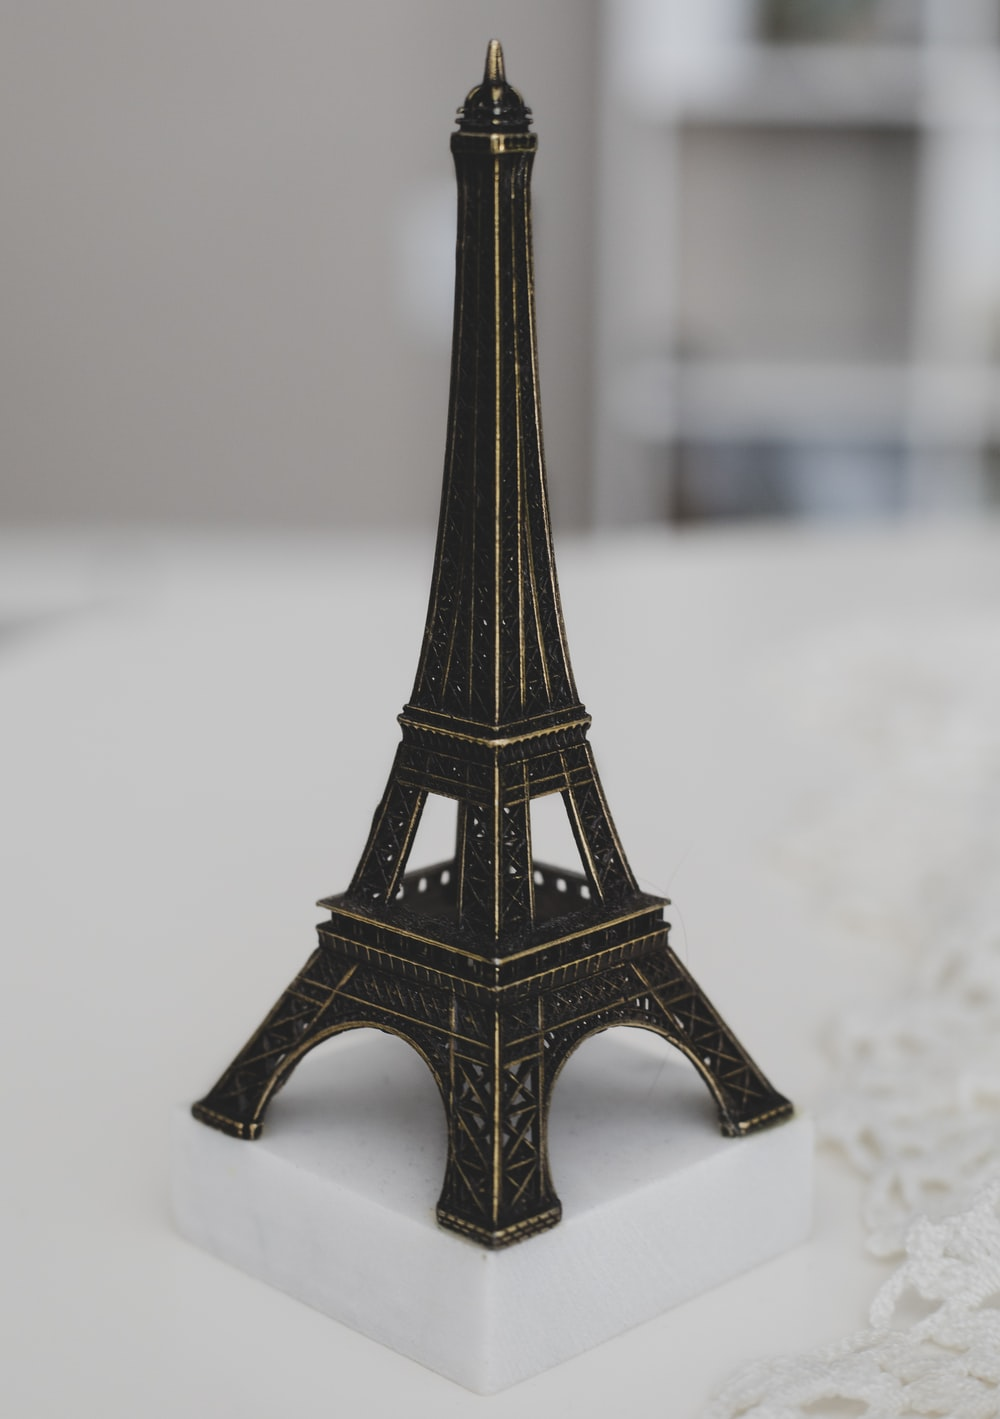 Eiffel Tower miniature on white surface